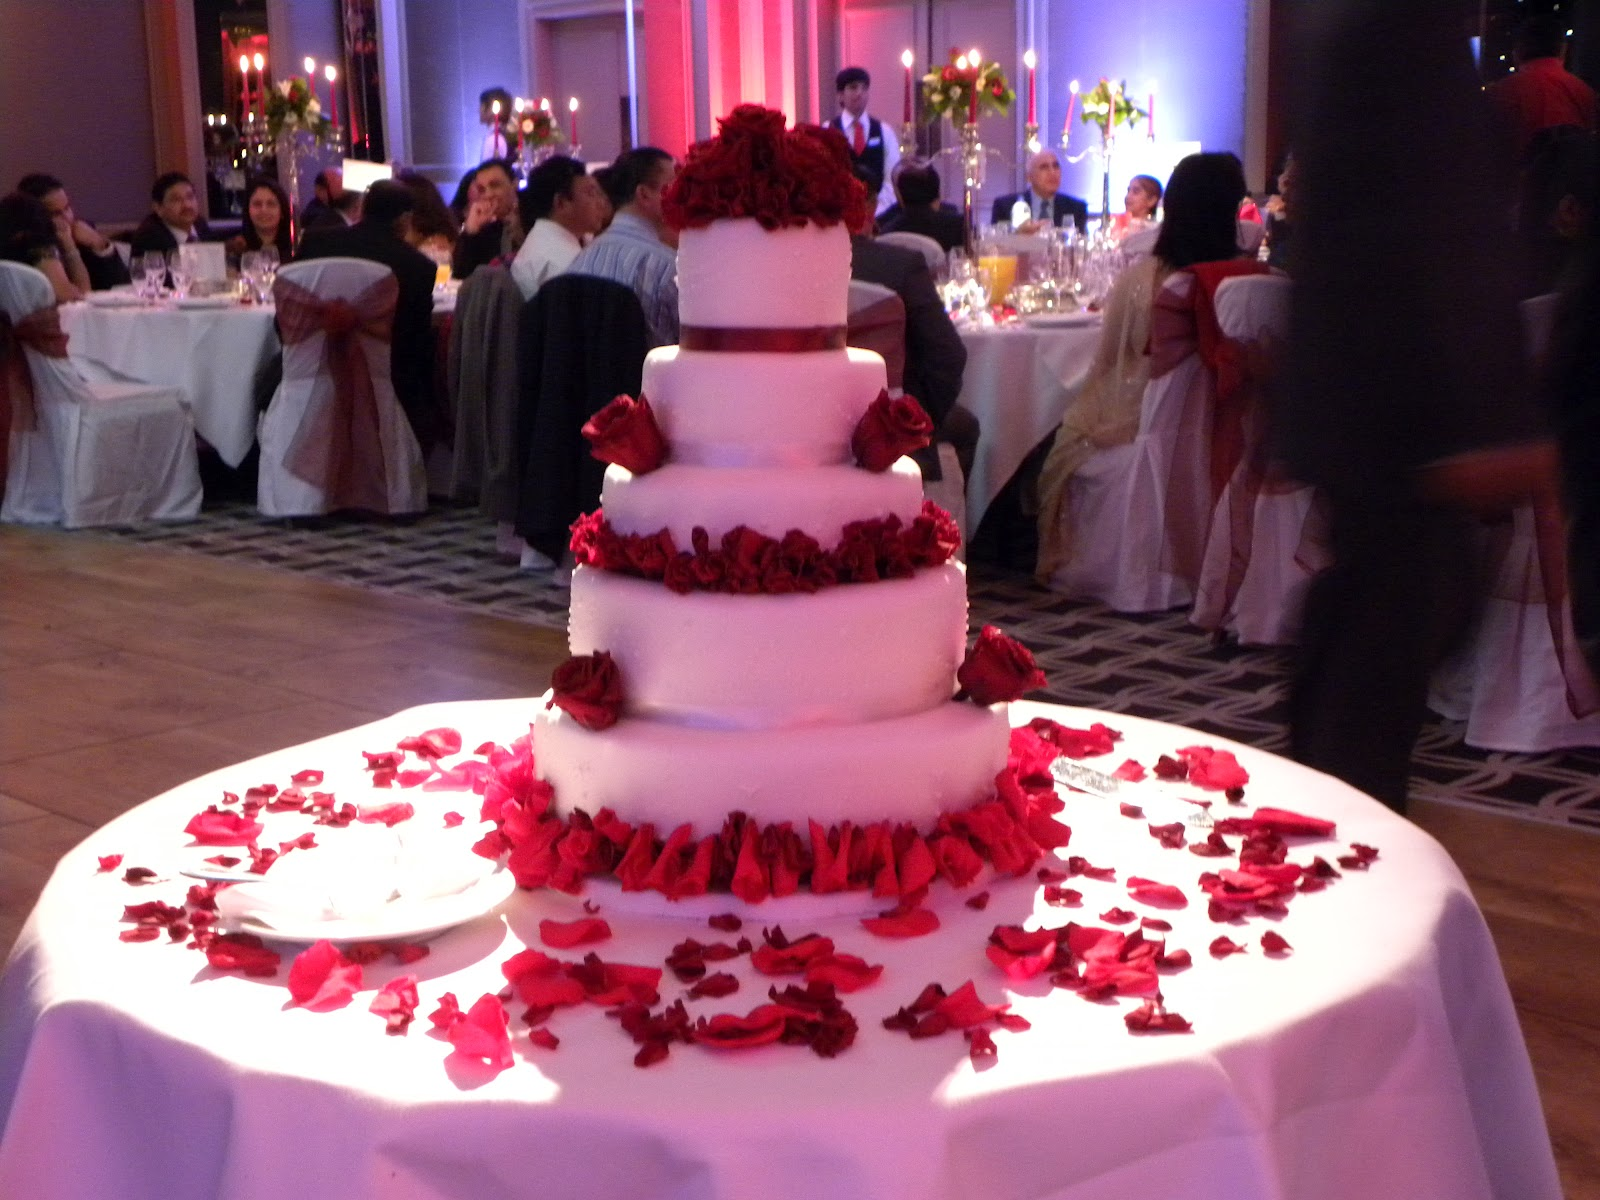 The World of Sweets Diary: 5 tier wedding cake for Shreaya & Pritesh